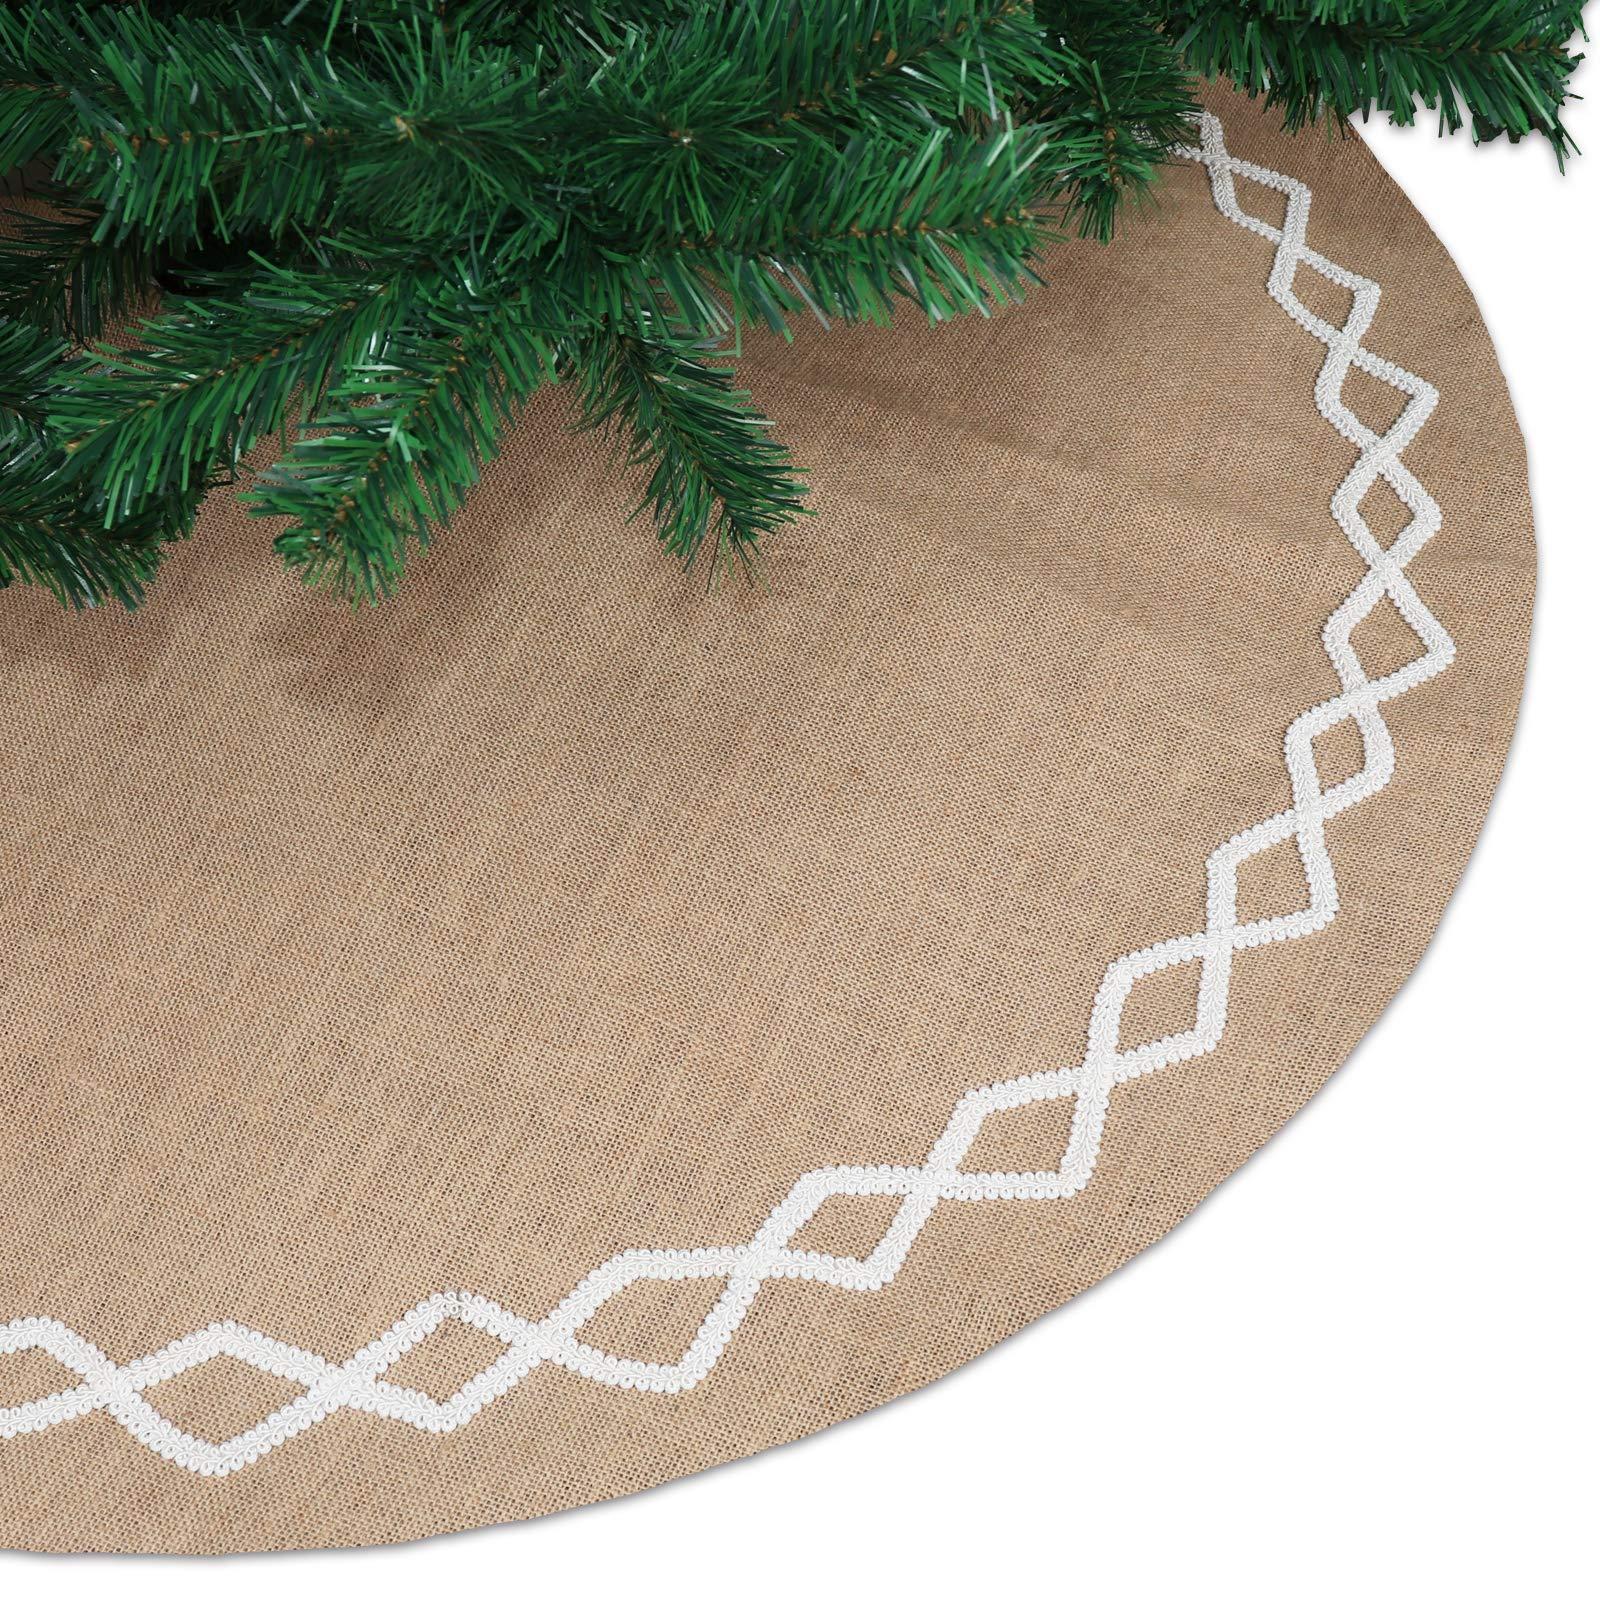 Rustic Xmas Tree Holiday Decorations Ivenf 48 inch Luxury Burlap Plaid Snowflake Christmas Tree Skirt with Thick Faux Fur Edge